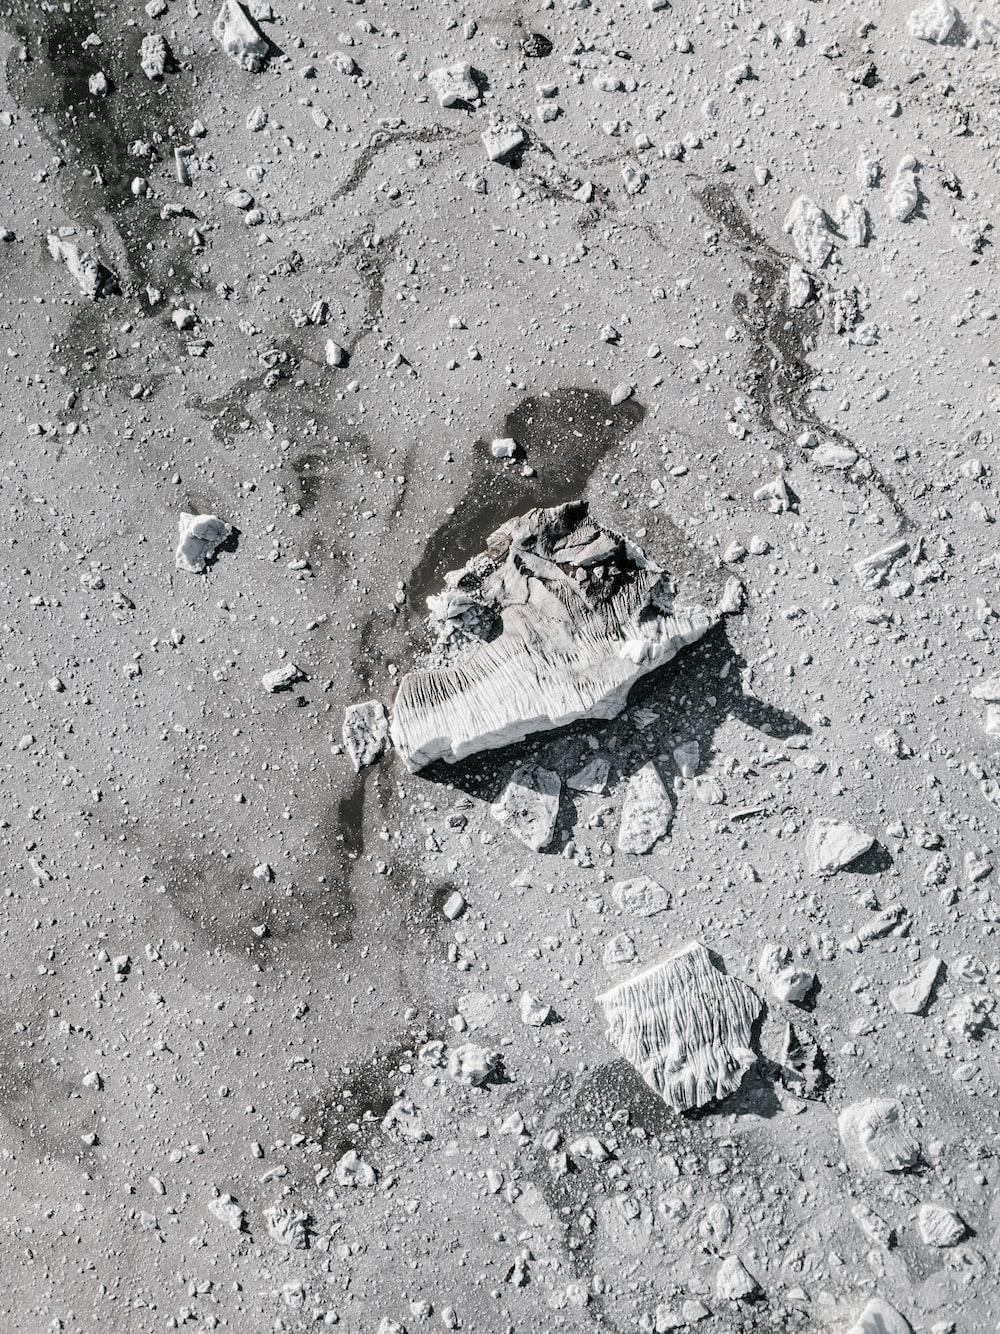 gray stones on gray dirt